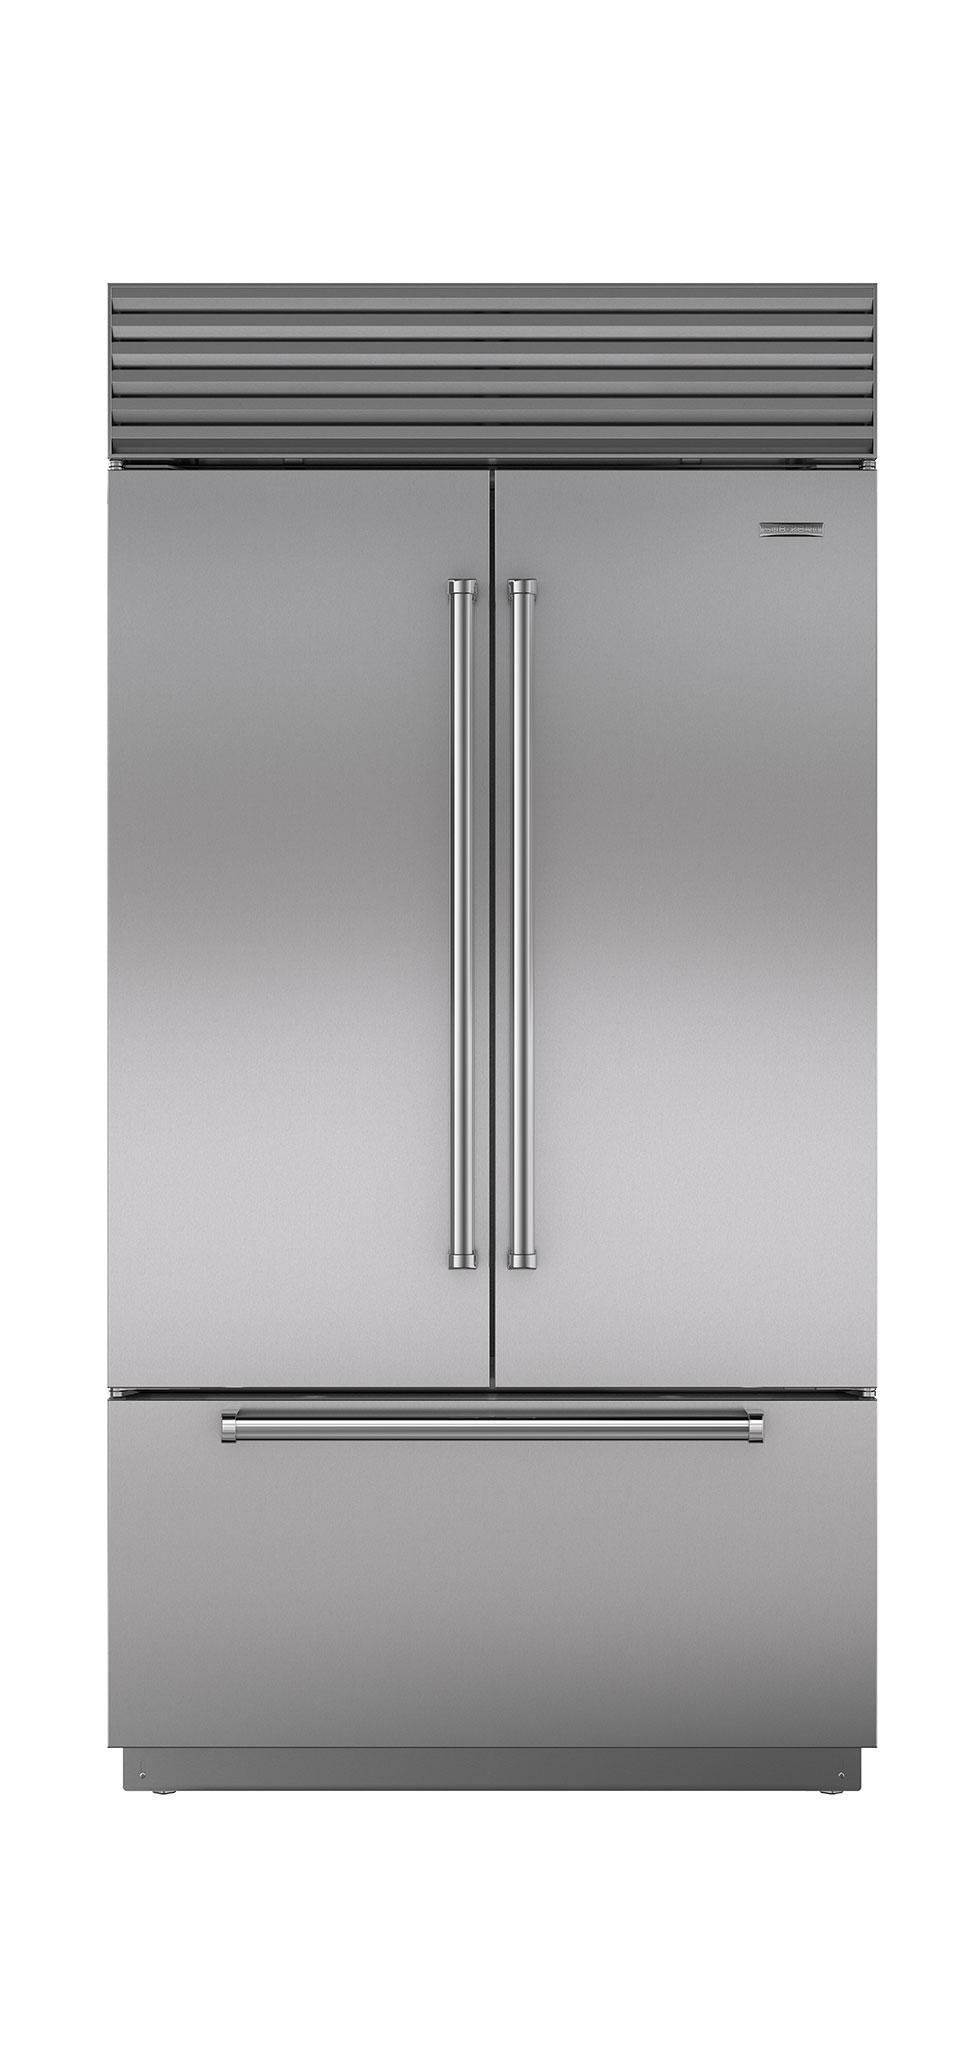 Sub Zero Model Bi42ufdsph Caplan S Appliances